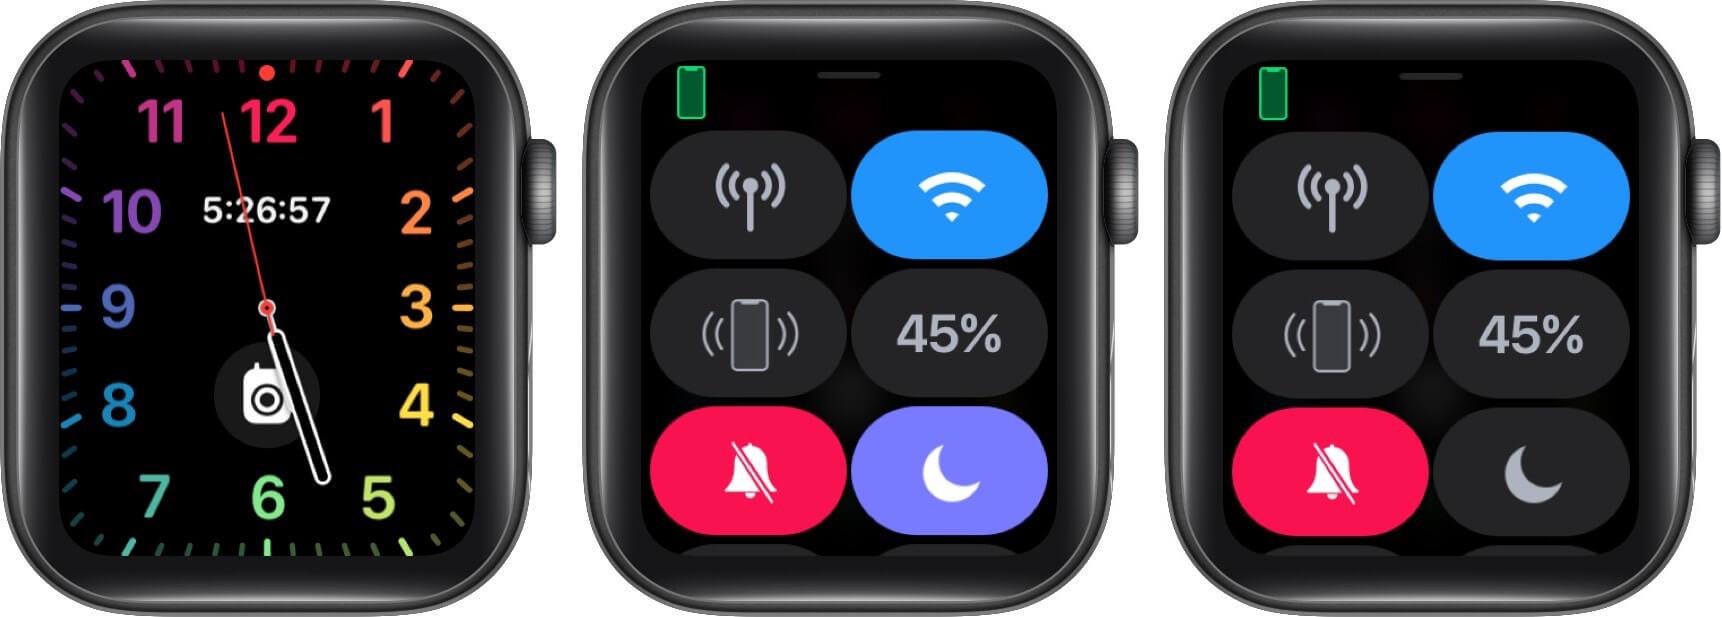 turn off do not disturb on apple watch